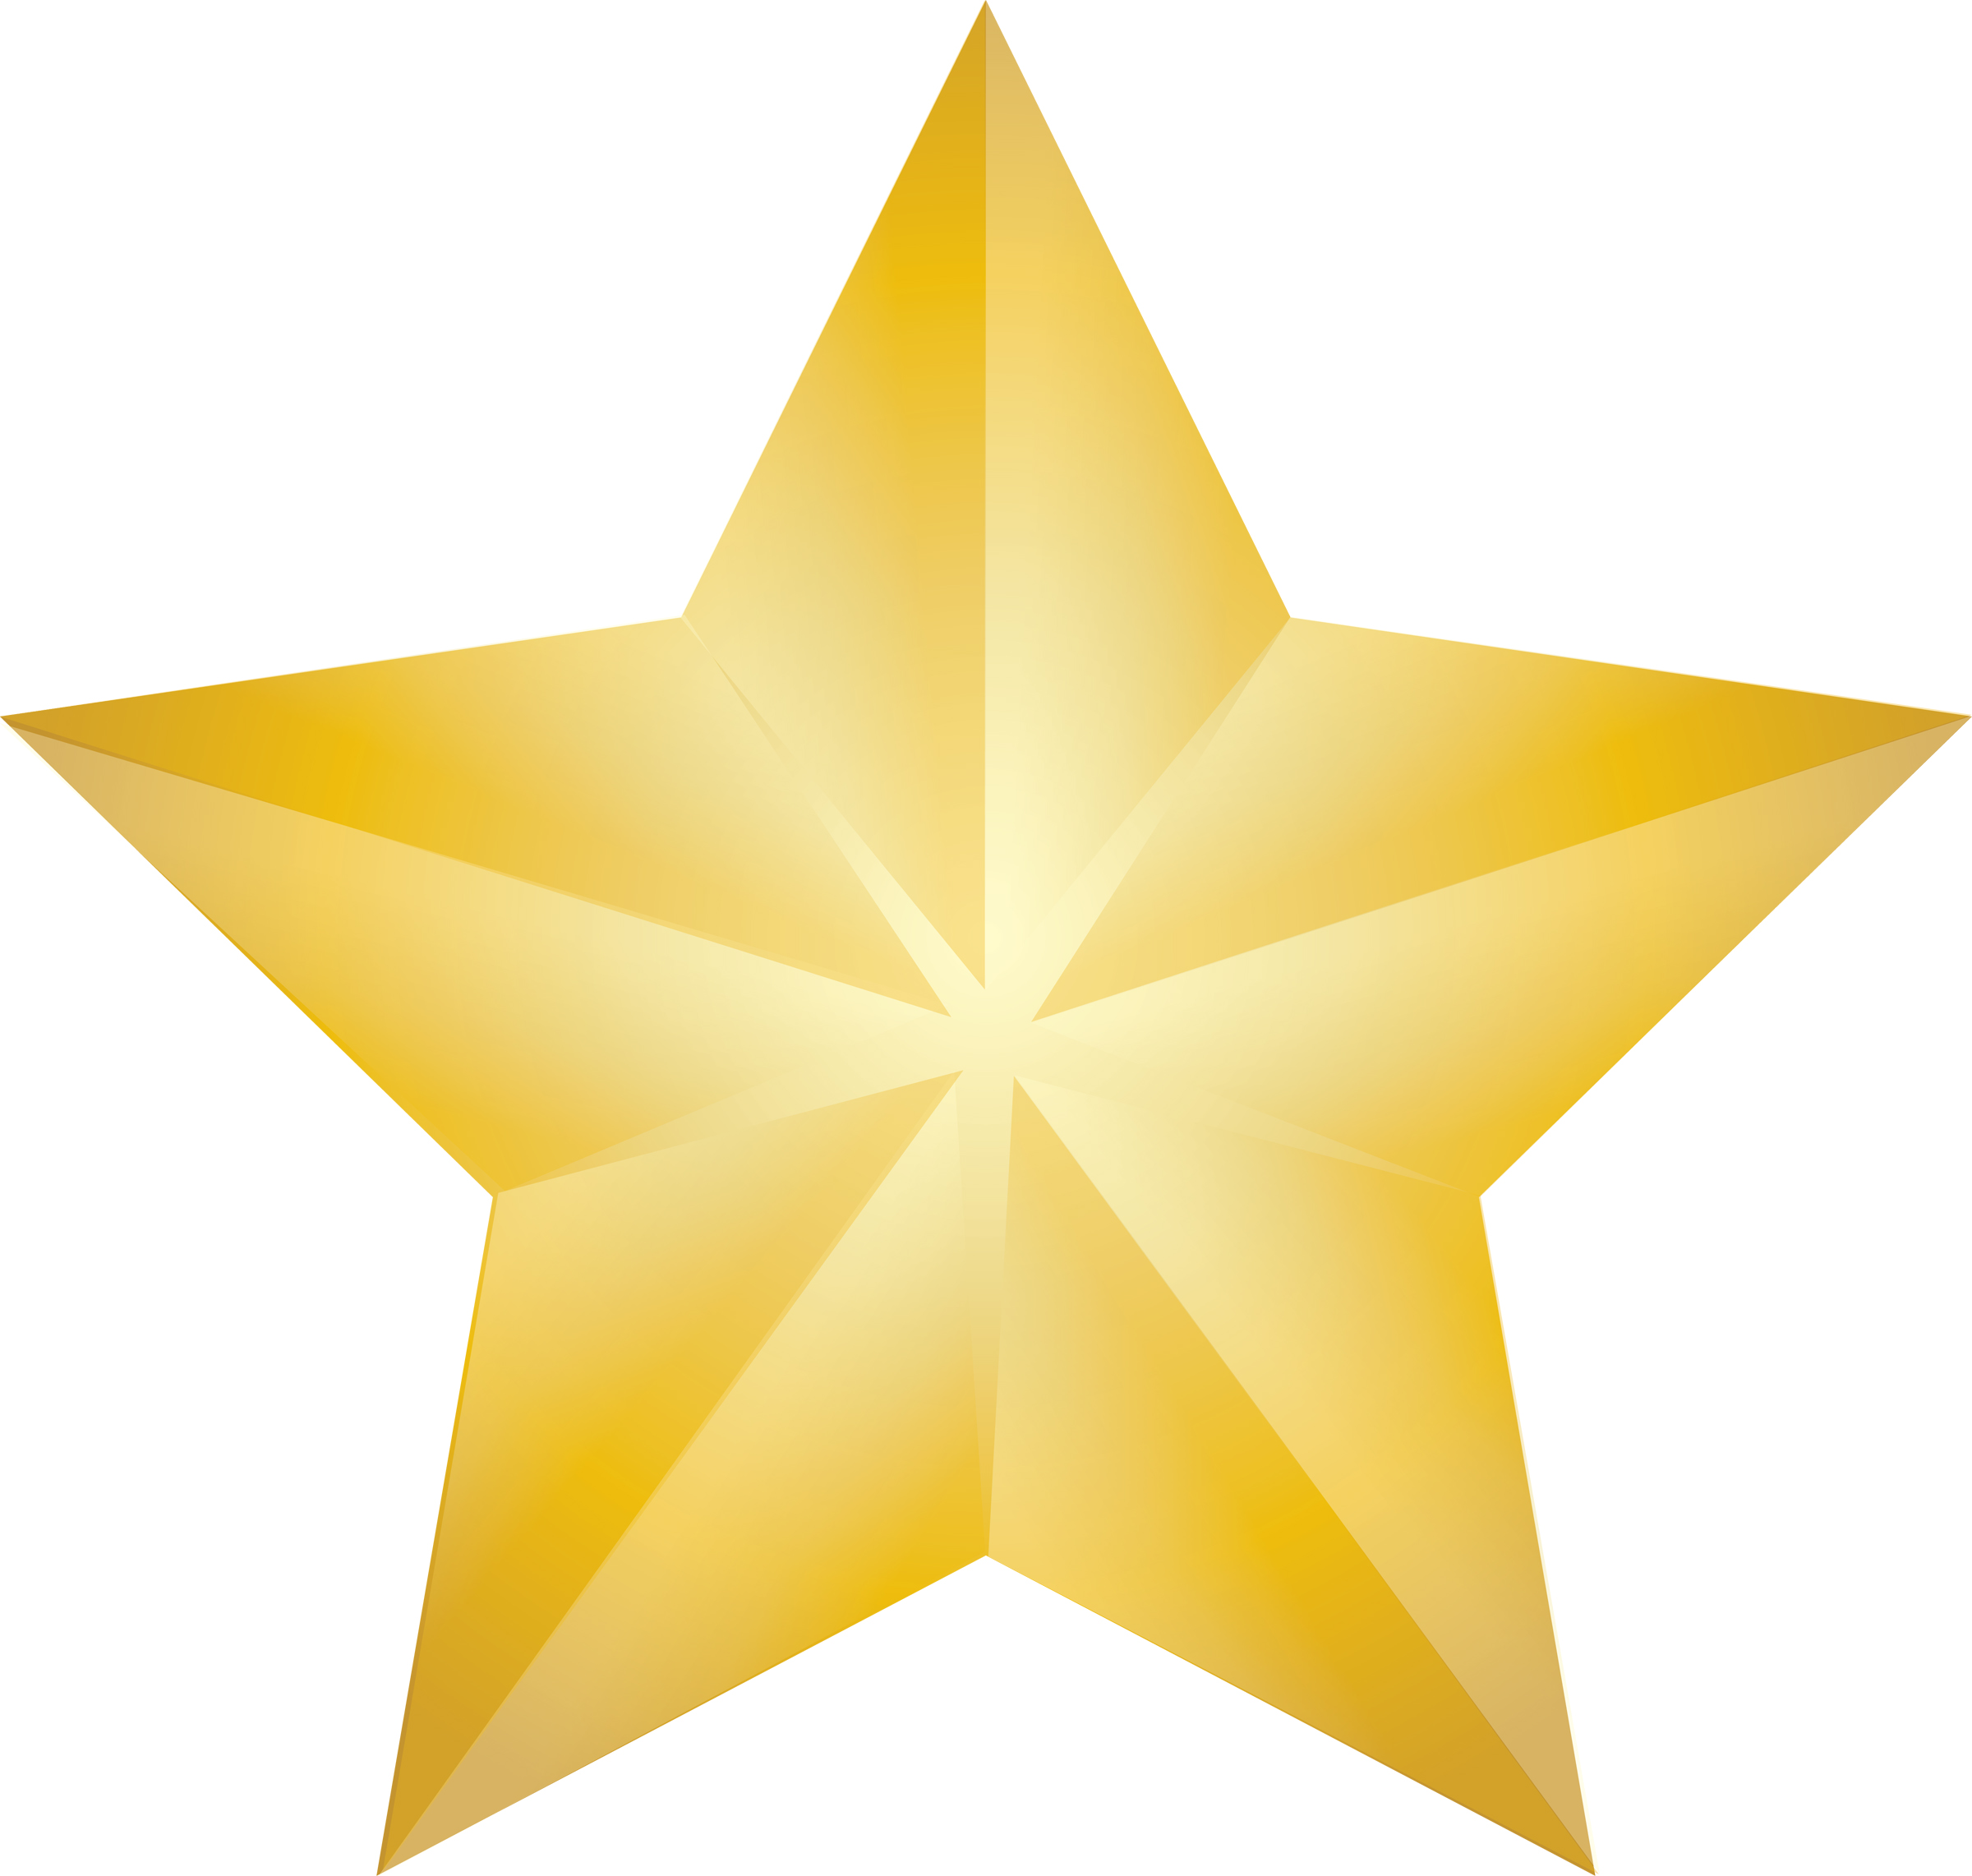 Star Award Clipart - Clipart Kid